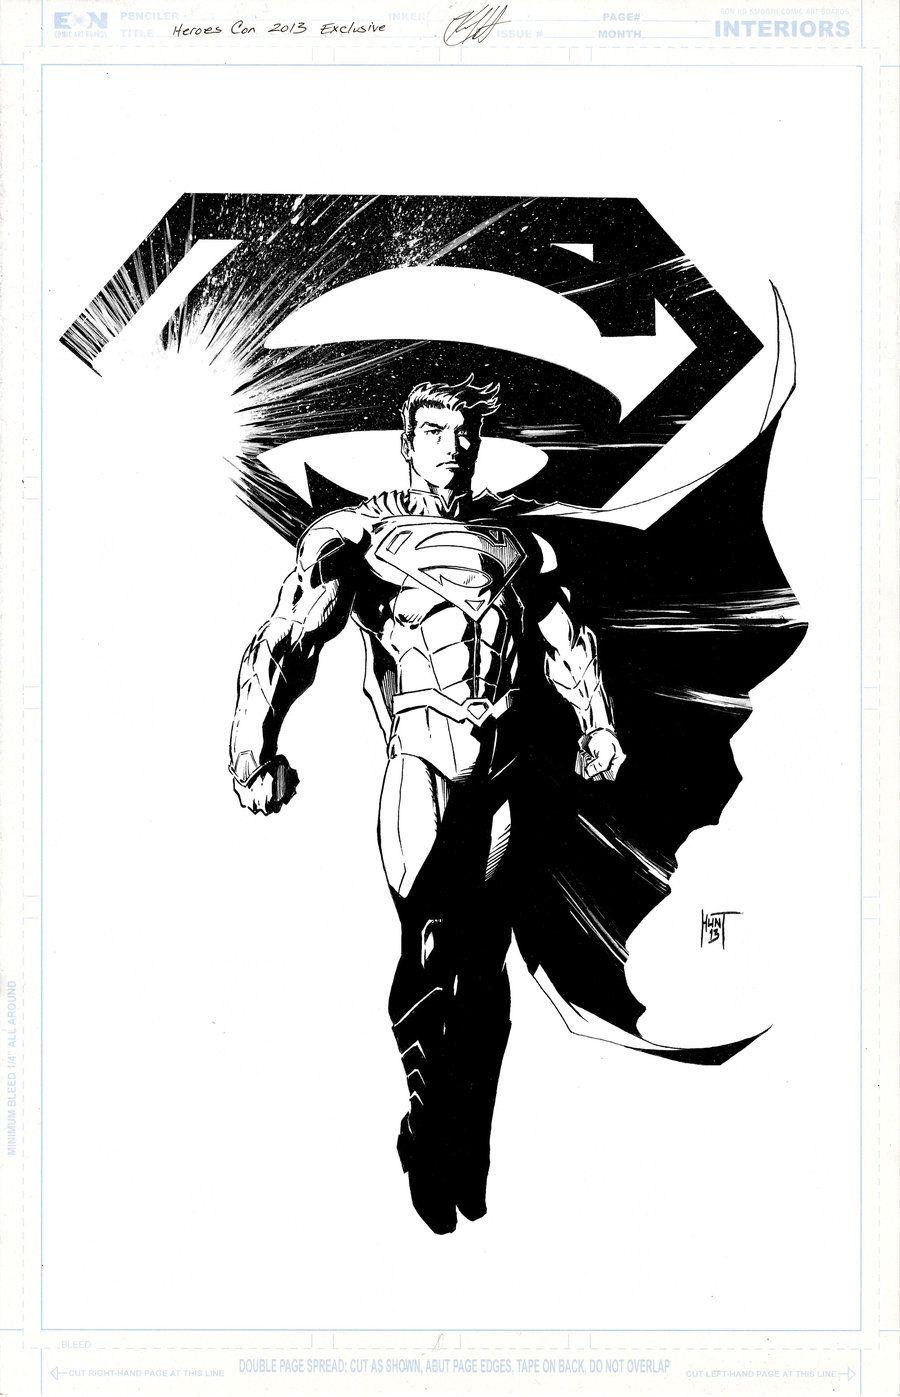 Black Superman Tattoo : black, superman, tattoo, Tomlinson, Pencil, Drawing, Superman, Tattoos,